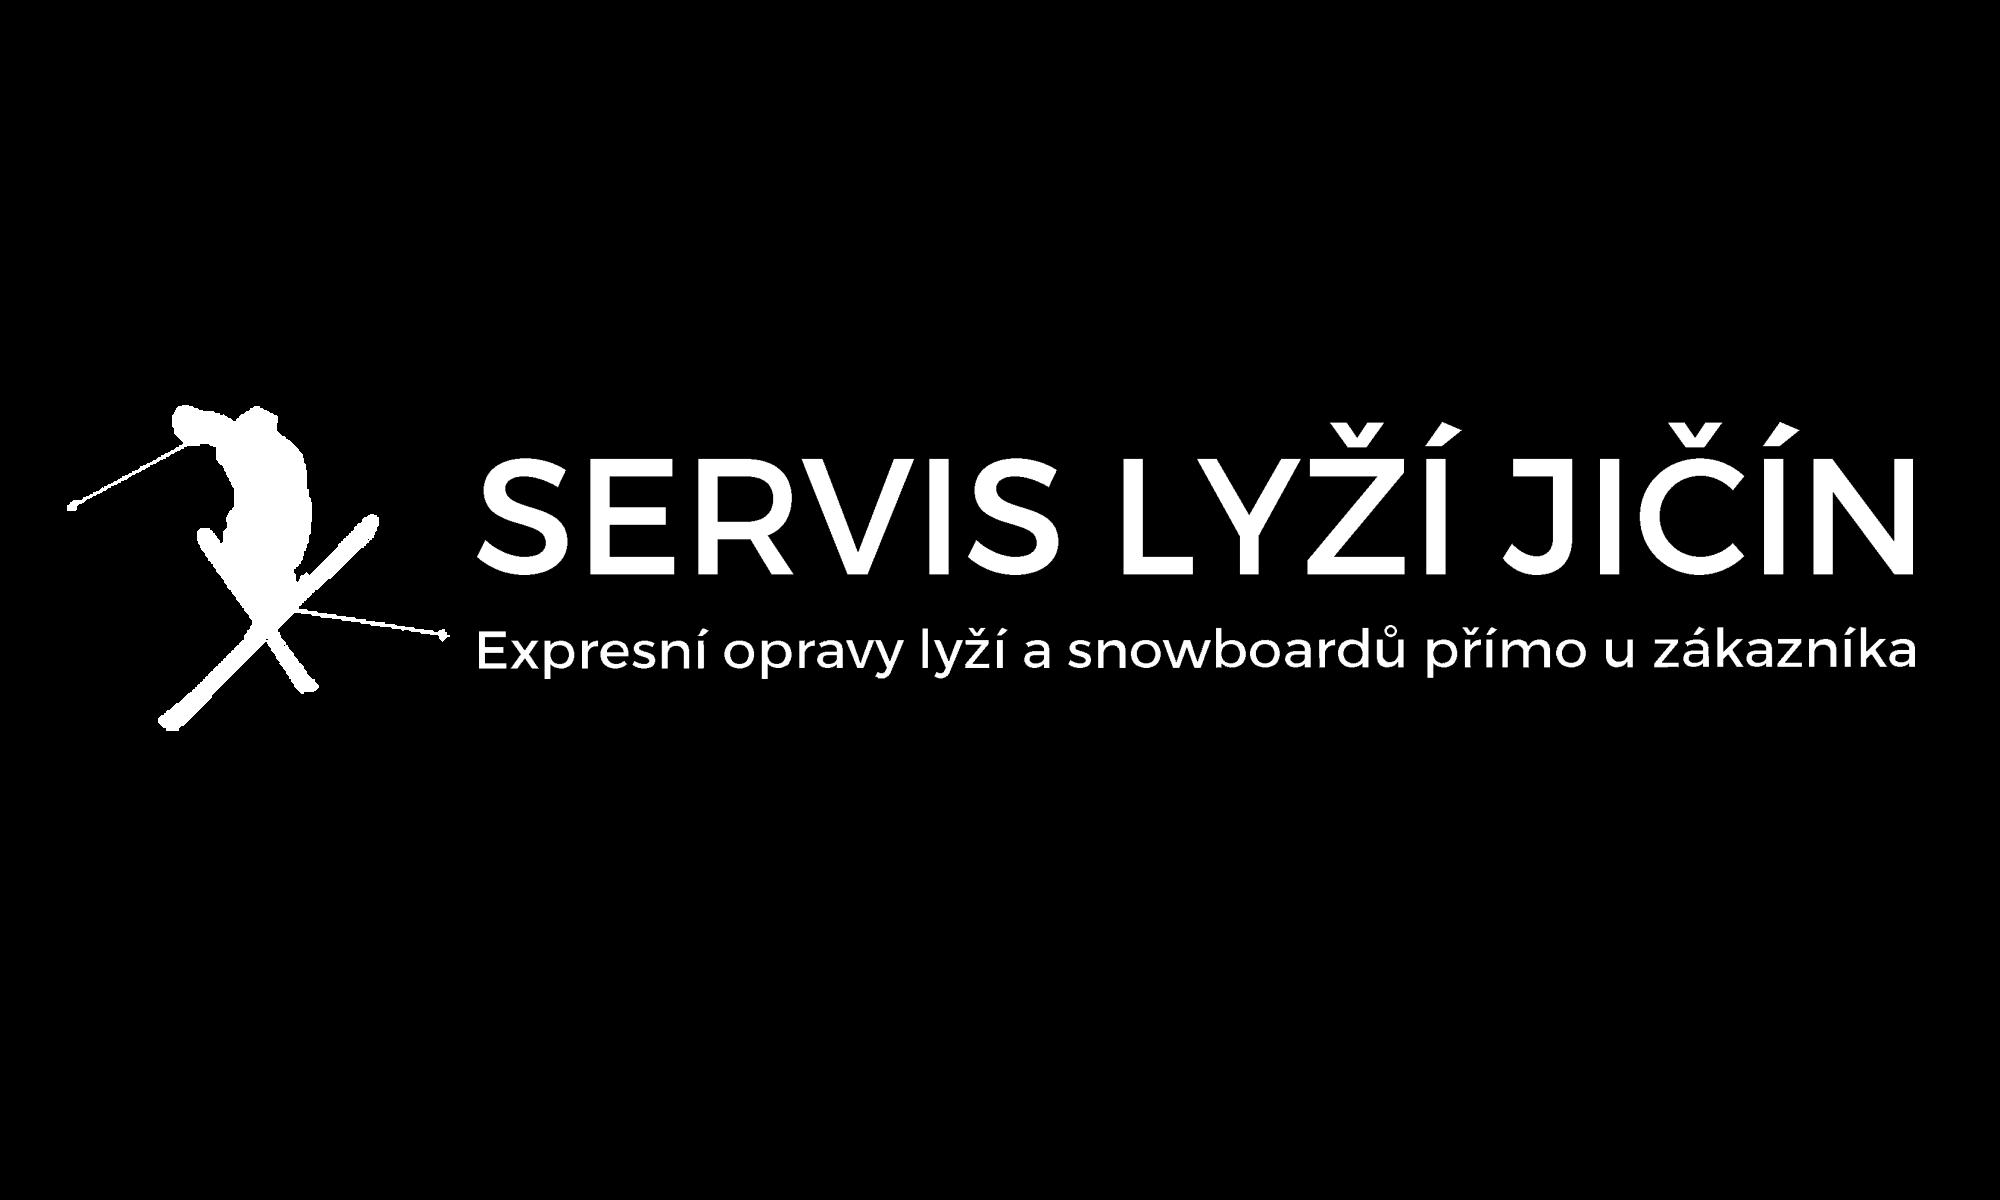 SERVIS LYŽÍ JIČÍN